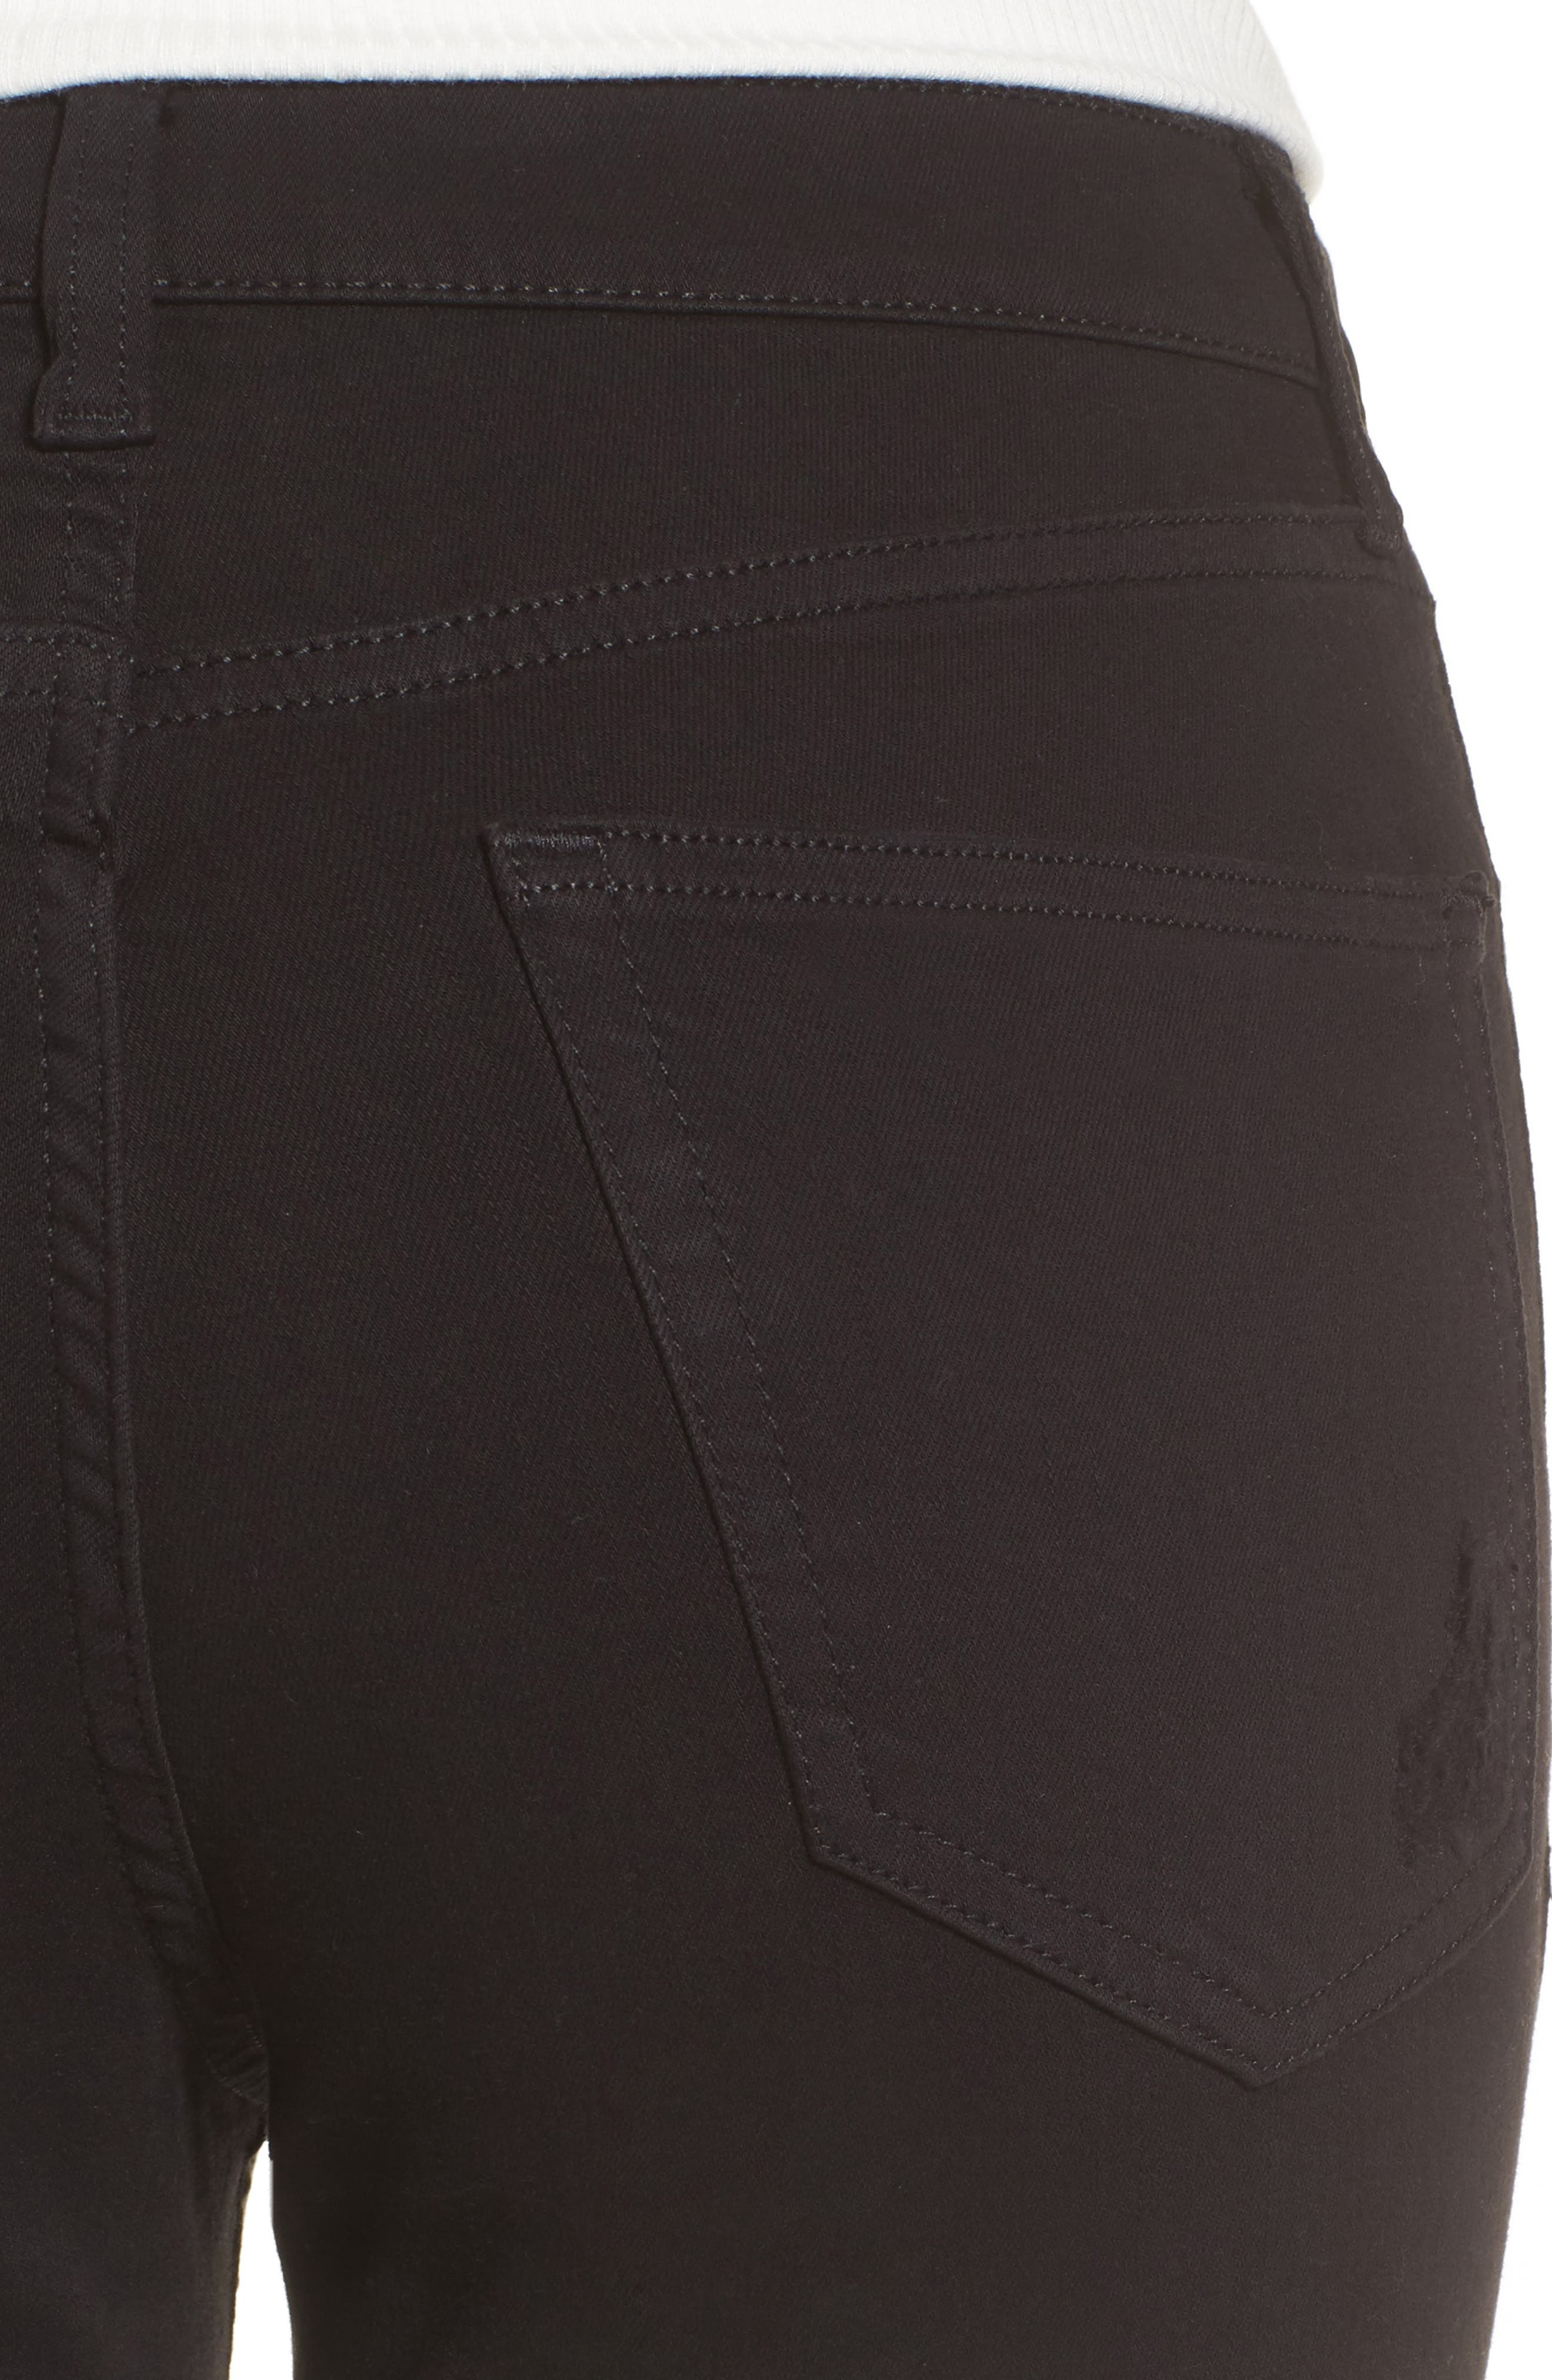 TOPSHOP, Moto 'Jamie' Ripped Skinny Jeans, Alternate thumbnail 5, color, 001